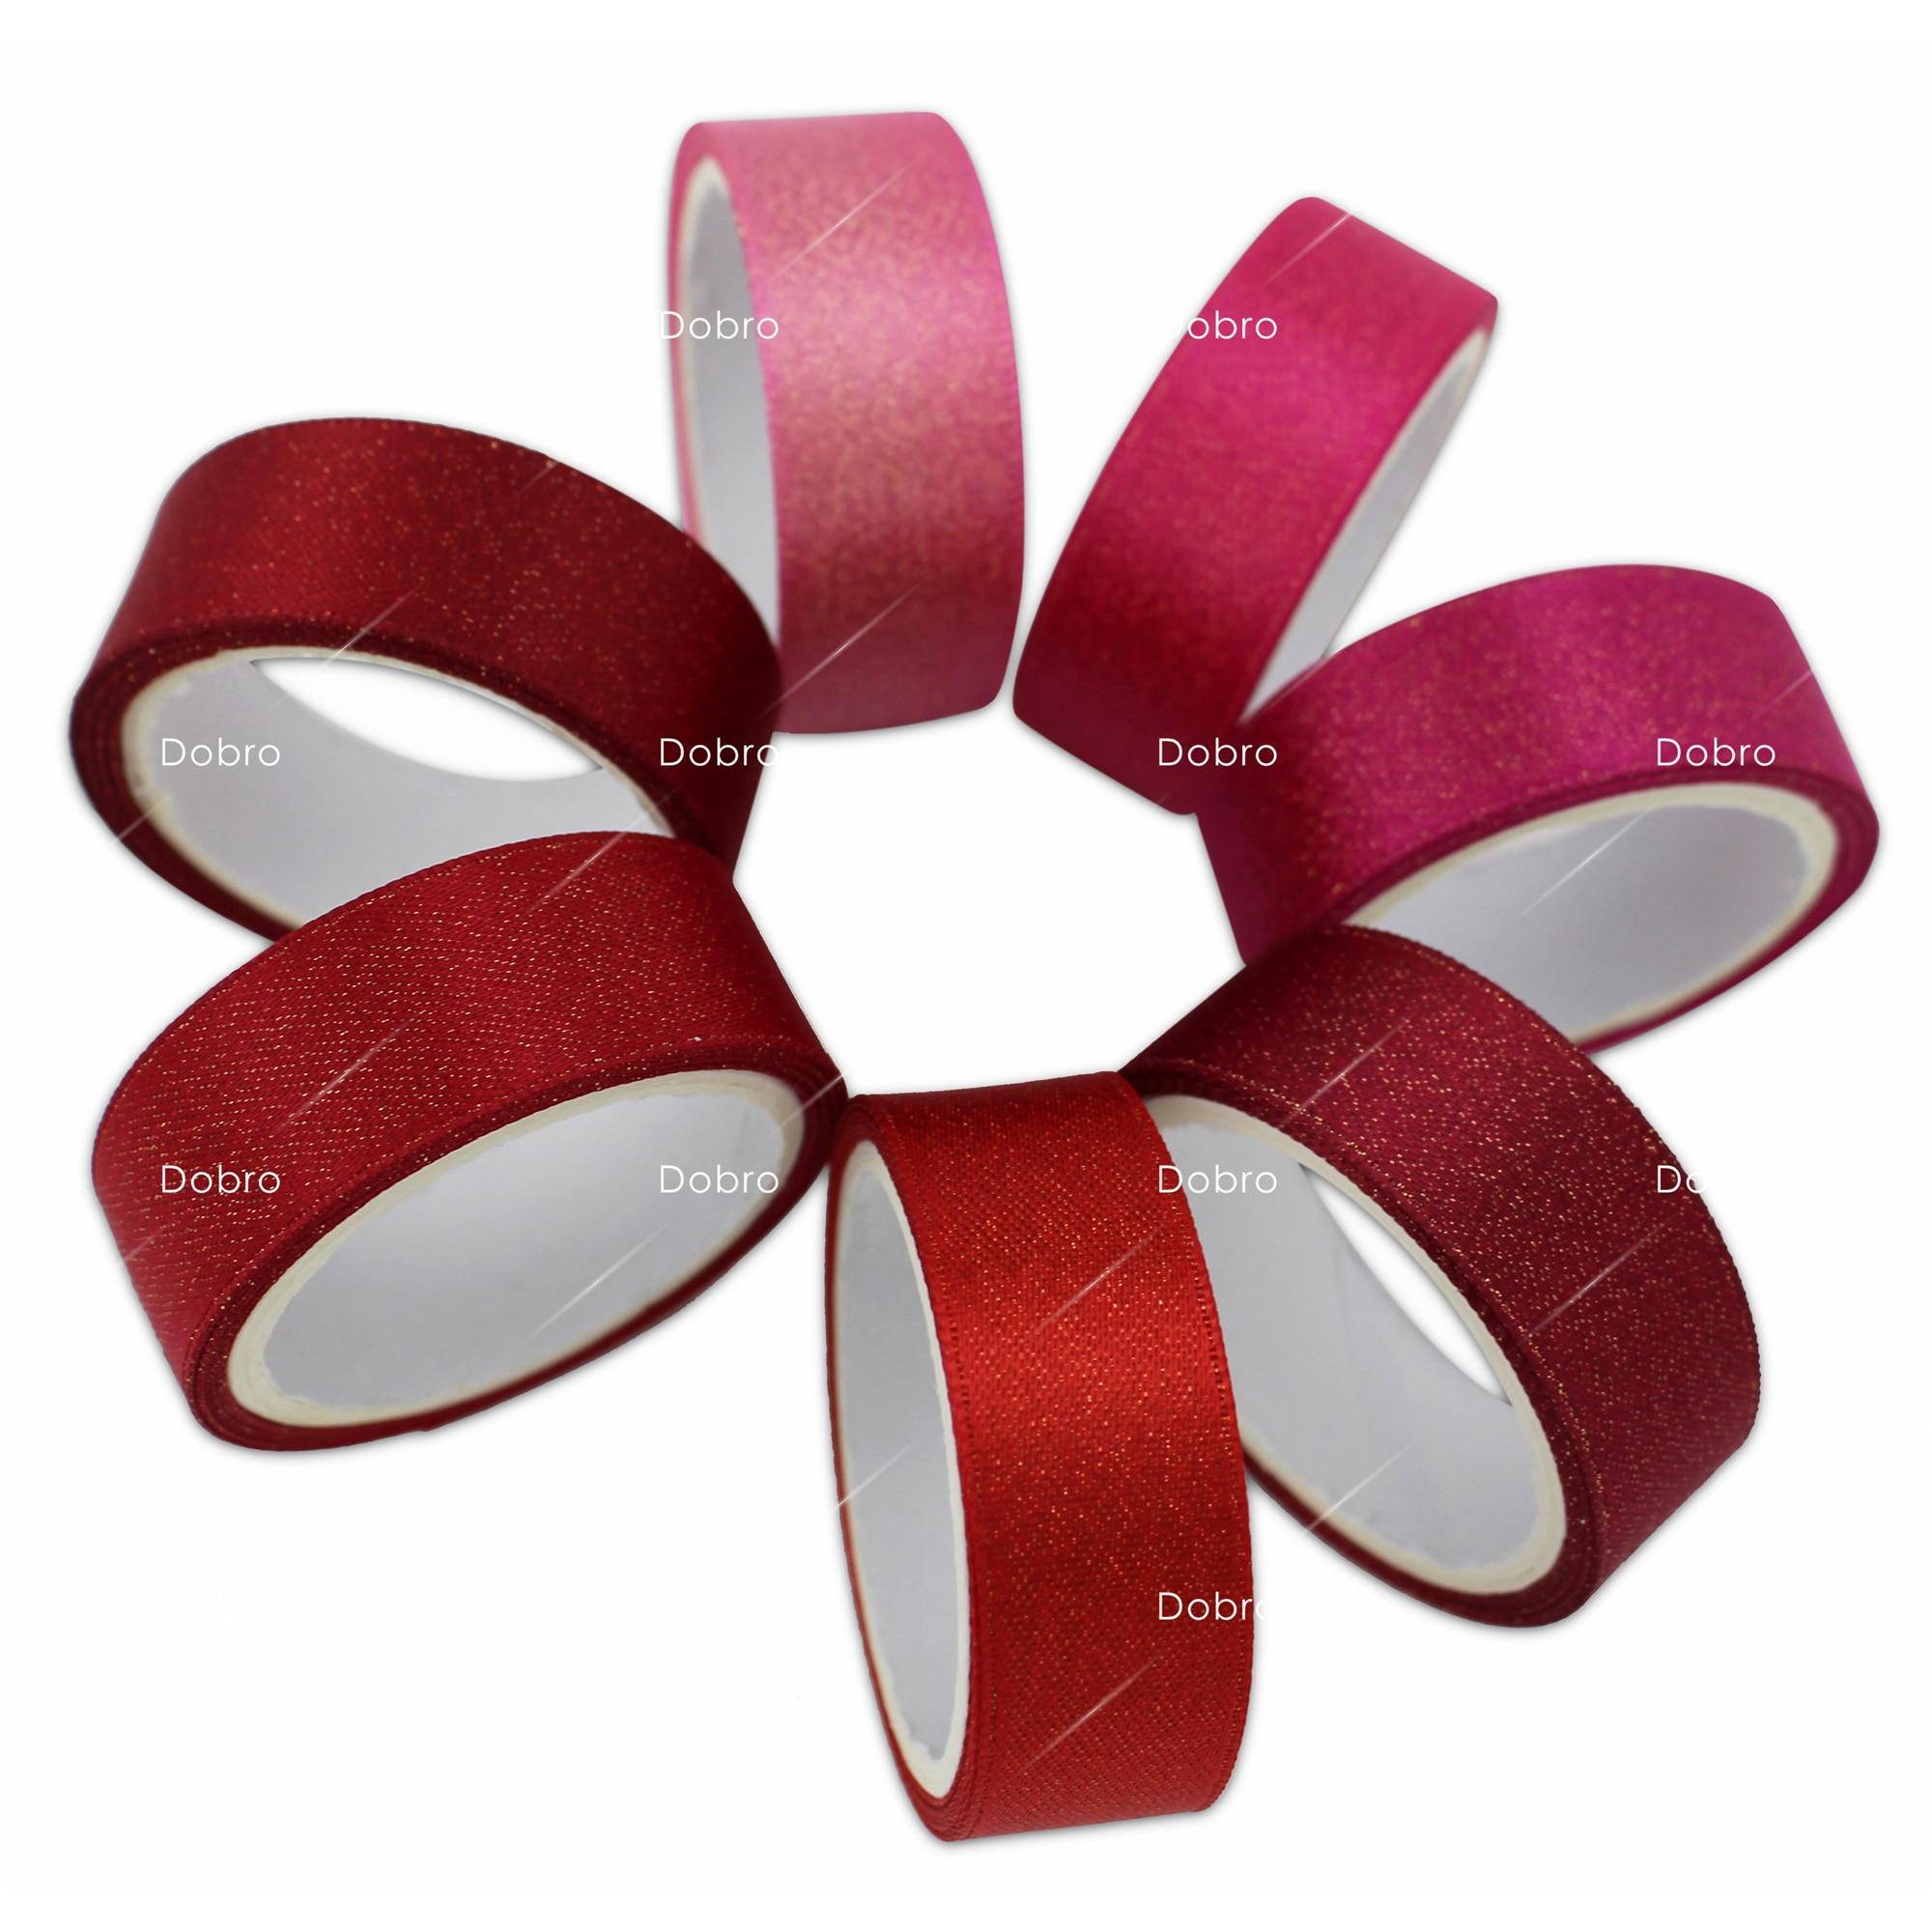 35 Colors Gold Purl Satin Ribbon 3 6 9 16 22 38mm - Өнер, қолөнер және тігін - фото 4